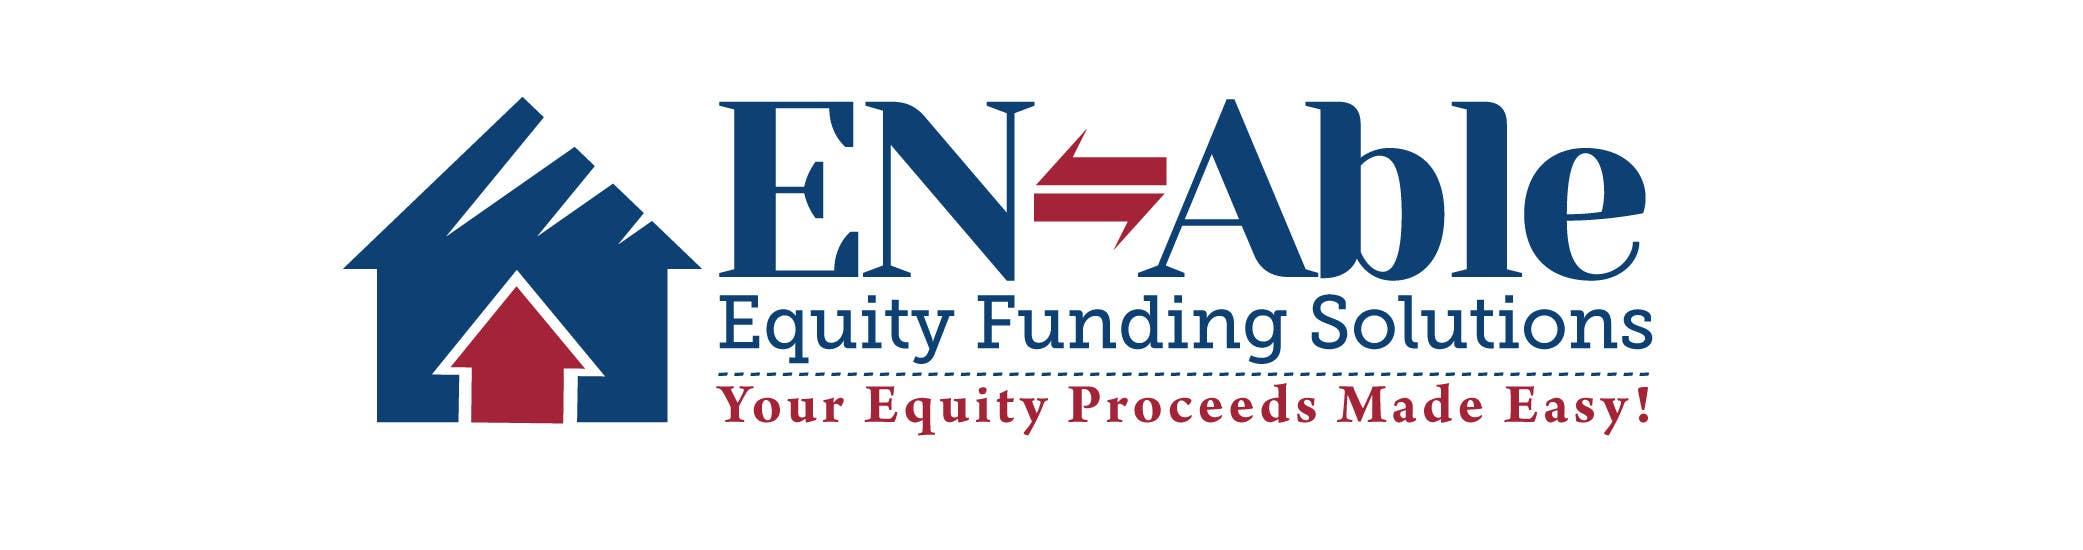 Penyertaan Peraduan #                                        21                                      untuk                                         Design a Logo for EN-Able Equity Funding Solutions (Pty) Ltd